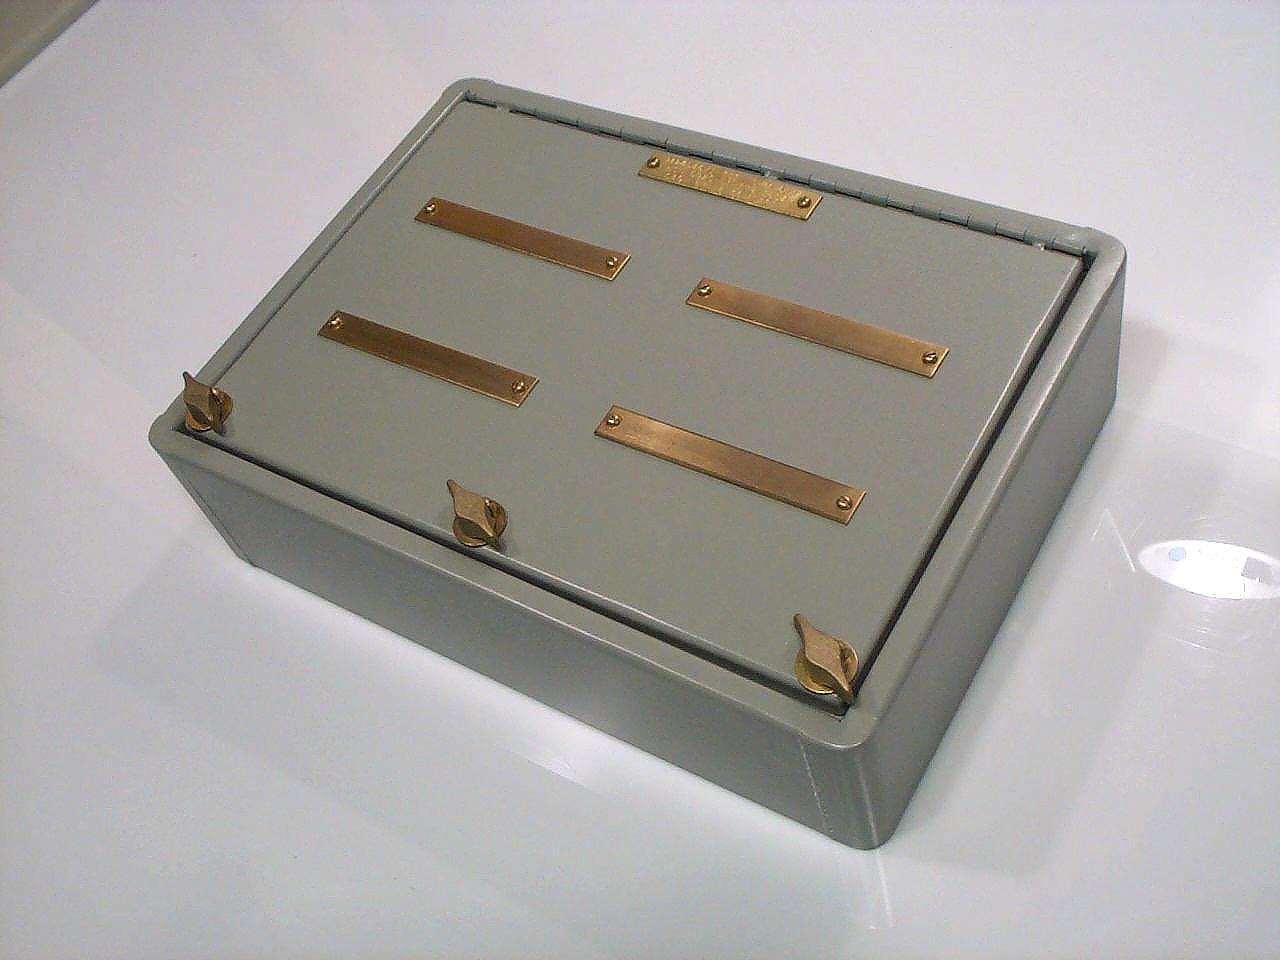 Symbol 544 Enclosed Fuse Box Sku